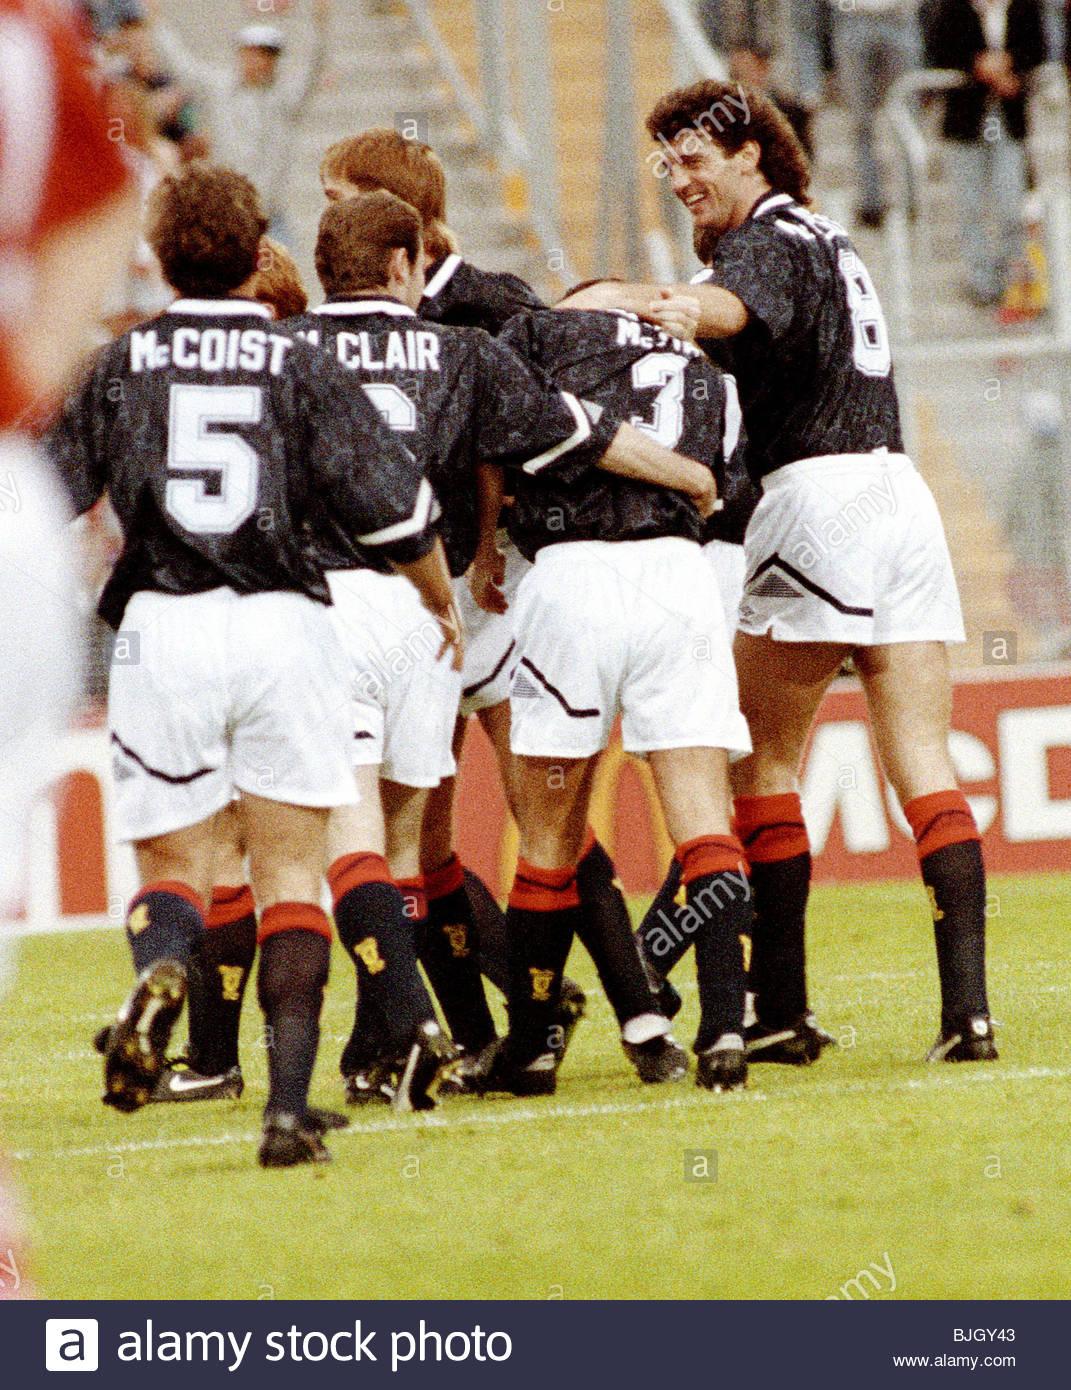 18/06/92 EUROPEAN CHAMPIONSHIP FINALS CIS V SCOTLAND (0-3) IDROTTSPARKEN - NORRKOPING Scotland's Paul McStay - Stock Image